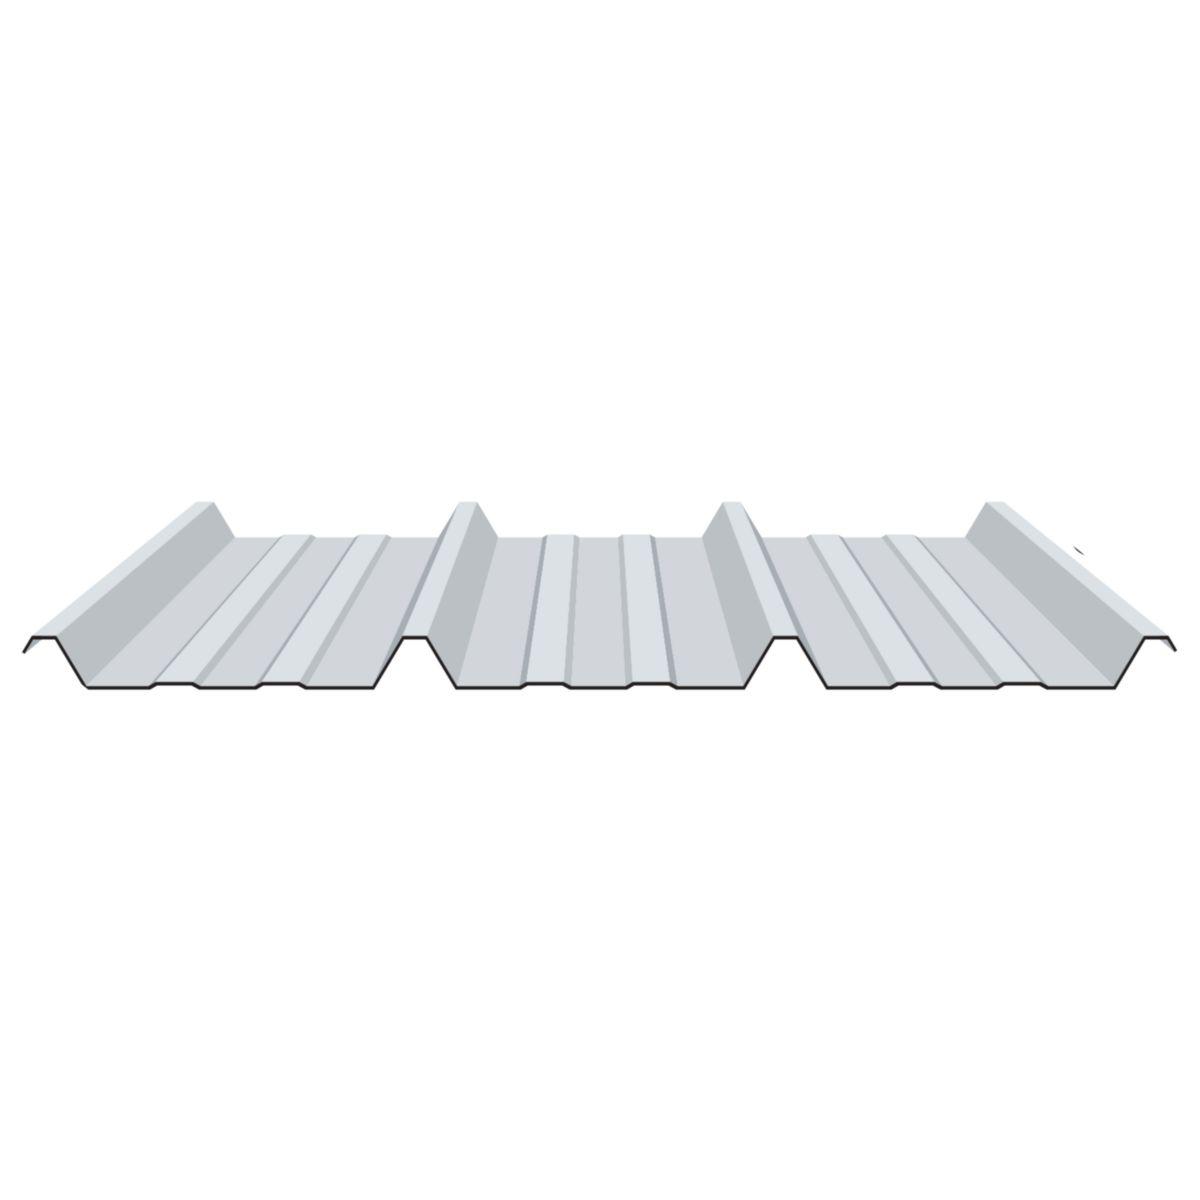 lambourde acier galvanis stunning plaque acier galvanis petite onde with lambourde acier. Black Bedroom Furniture Sets. Home Design Ideas